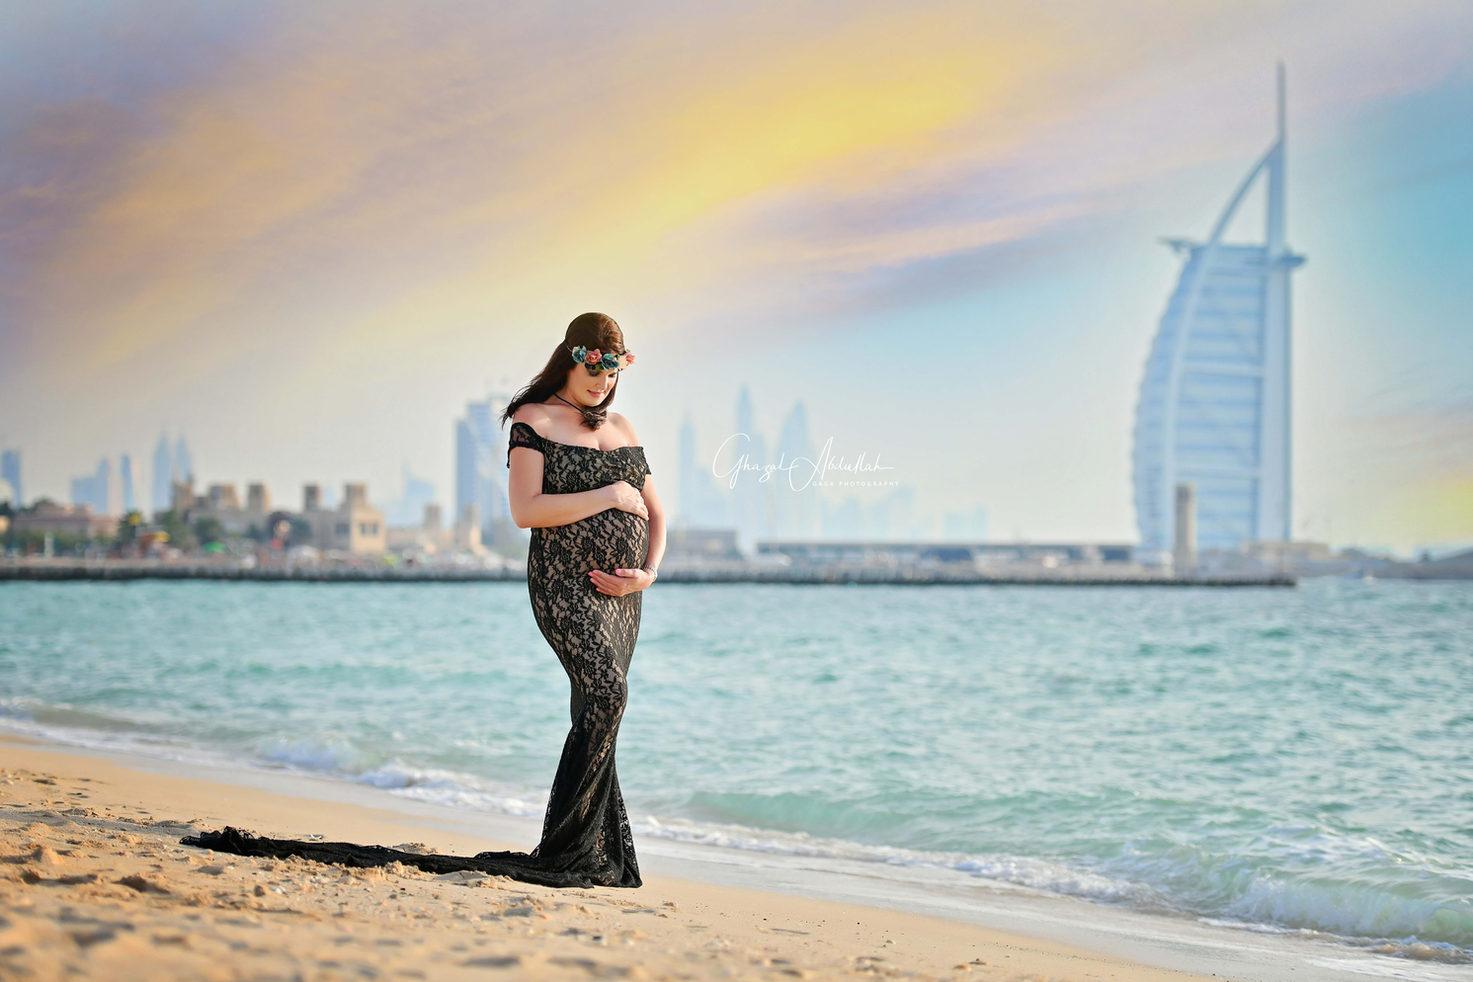 #pregnancyphotos #pregnancyphotography #pregnancy photo ideas #pregnancyphotographers #wheretogetpregnancyphotos  #maternityphotoideas #professionalmaternityphotos #propsformaternitypictures #maternityphotoshoot #maternitypictures #Maternityphotoshootdress #Maternityphotoshootgowns #Maternitypicturesoutfits #Maternityshootoutfits #Newbornphotographers #bestnewbornphotographer #newbornphotographer #newbornphotography #newbornphotographystudio #maternityphotographer #maternityphotographers #maternityphotographerdubai #bestmaternityphotographer #bestphotographystudio #maternityphotography #maternityphotographystudio #familyphotographystudio #cakesmashphotographerdubai #cakesmashphotographer #cakesmashphotographystudio #cakesmashphotography